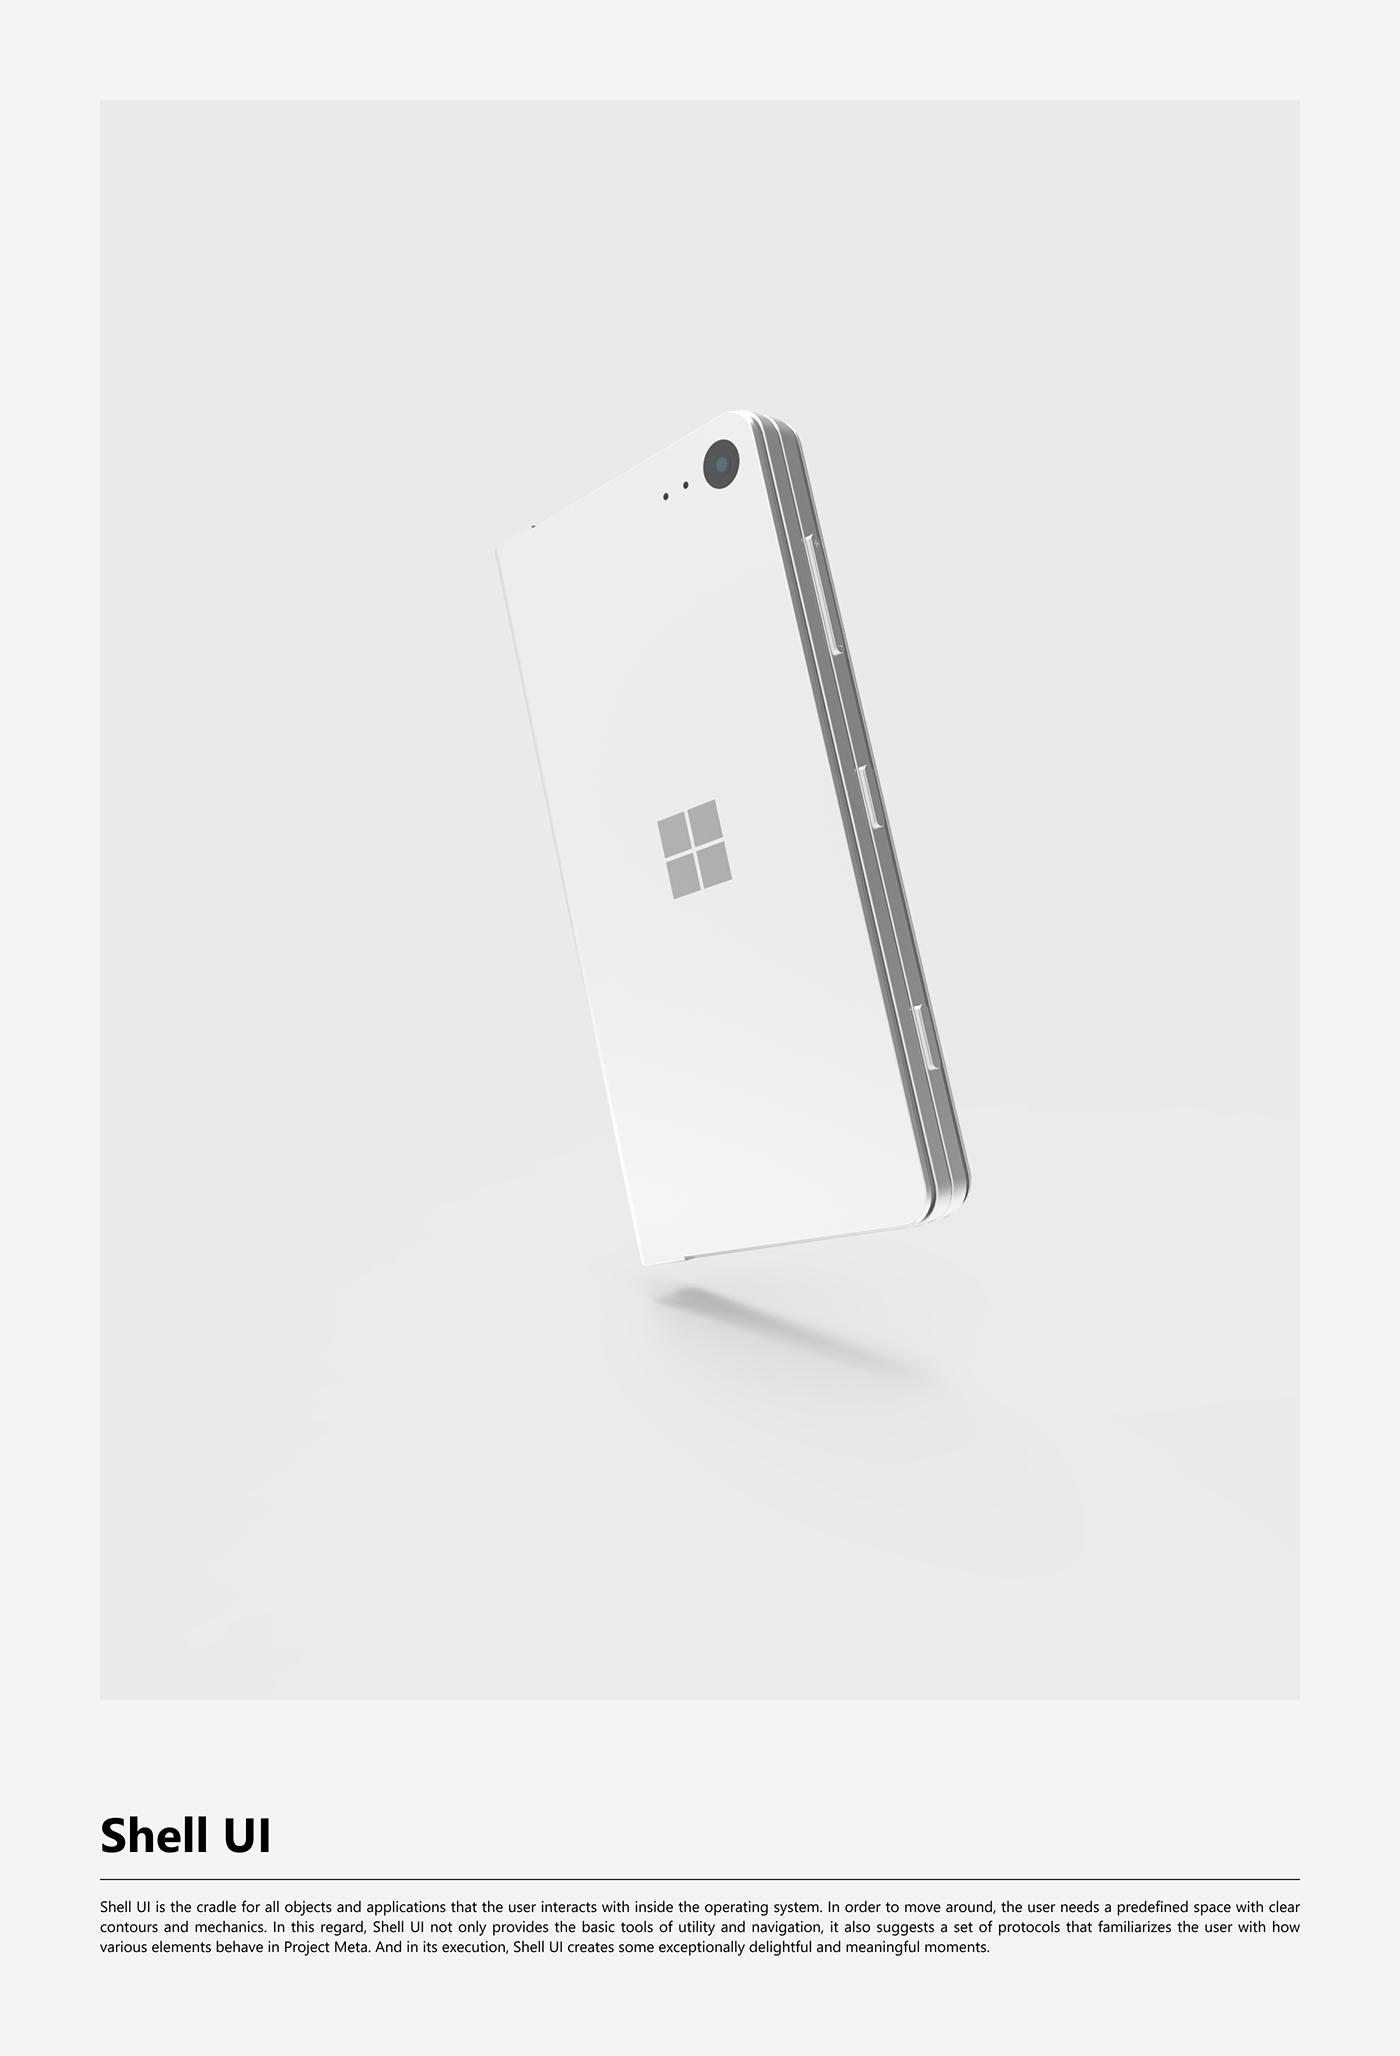 windows,Microsoft,surface,Andromeda,Foldable,devices,phone,tablet,Laptop,desktop